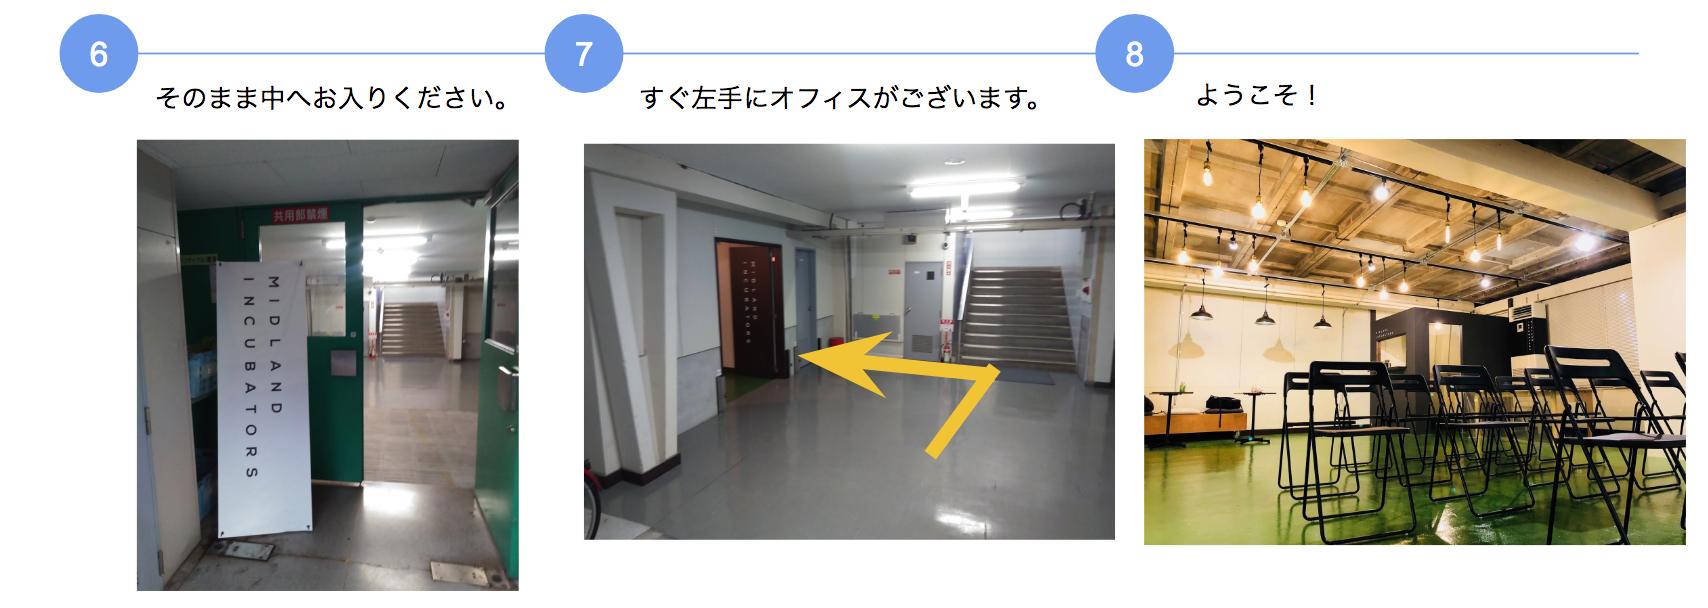 f:id:toyoshi:20180619161057p:plain